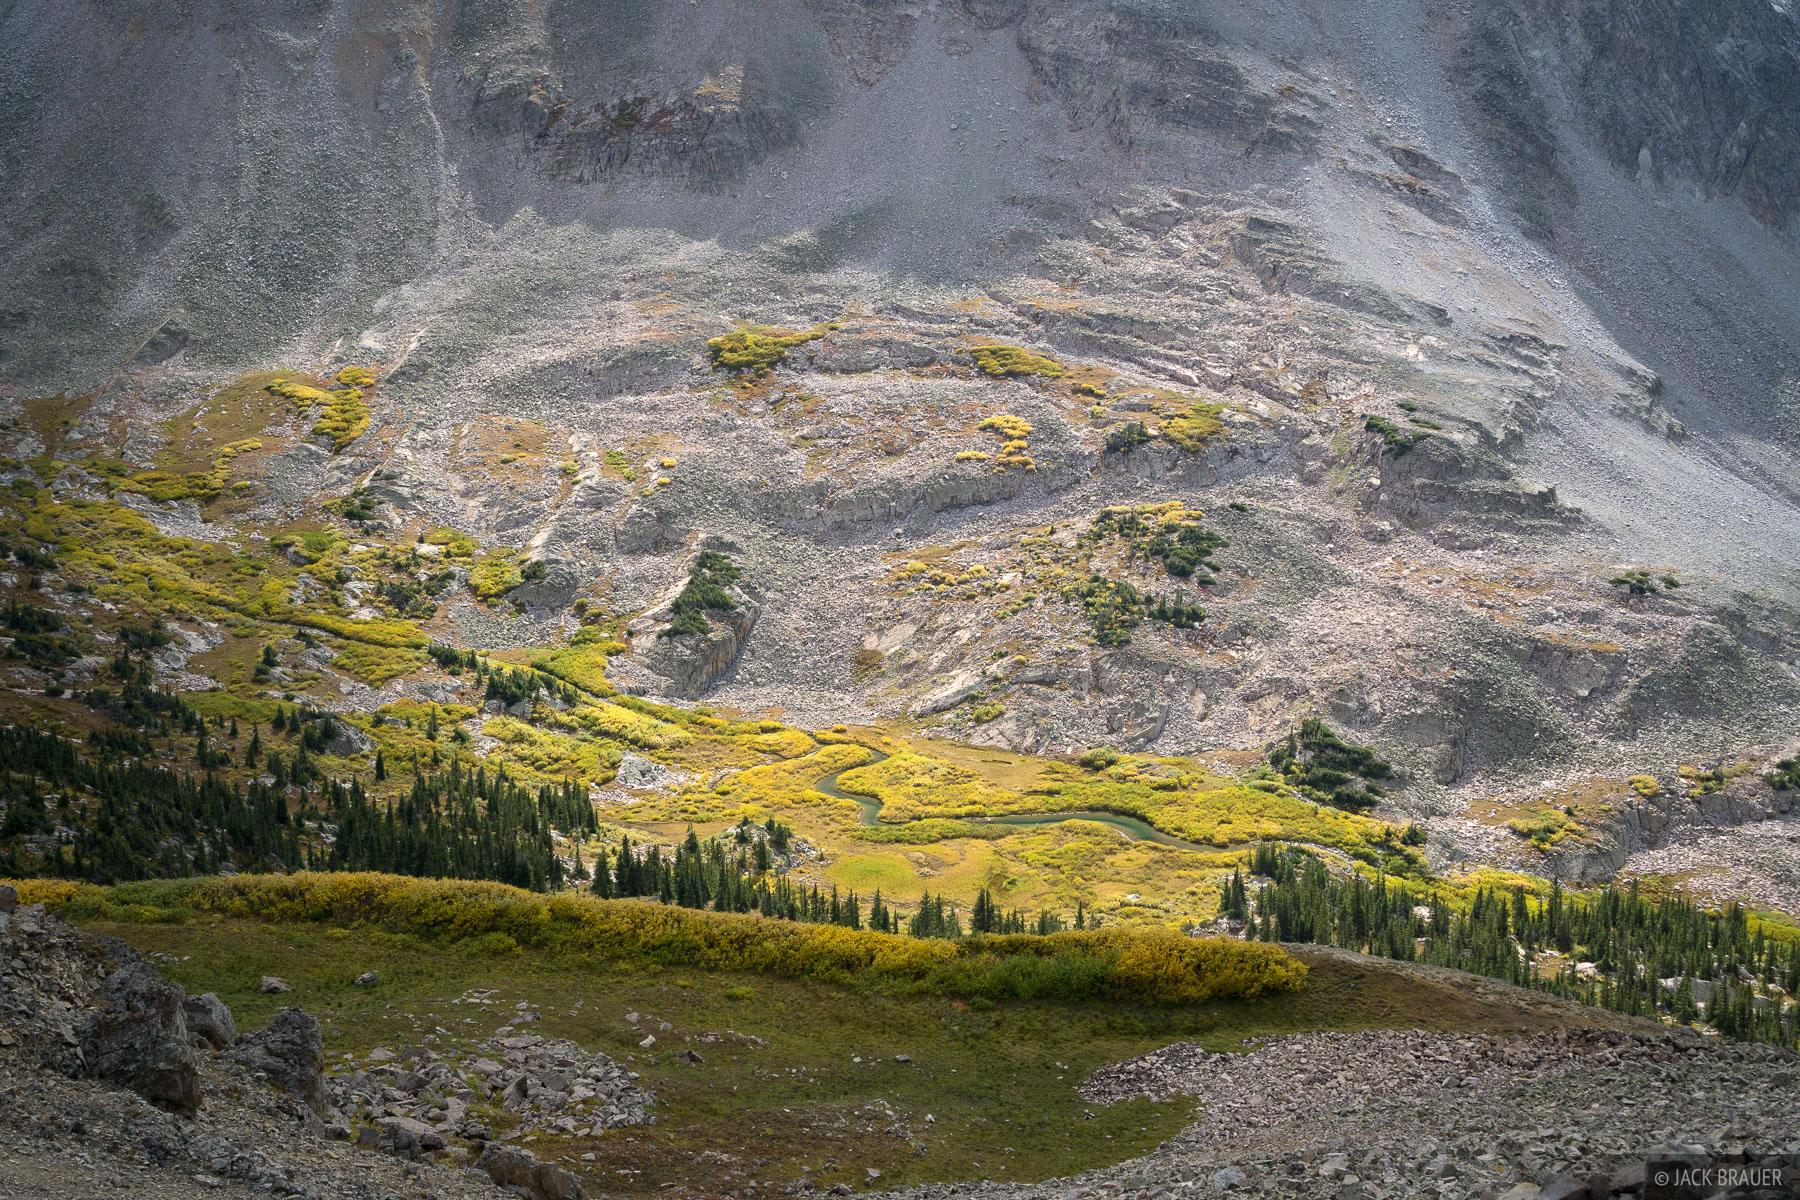 Colorado, Elk Mountains, Maroon Bells-Snowmass Wilderness, photo